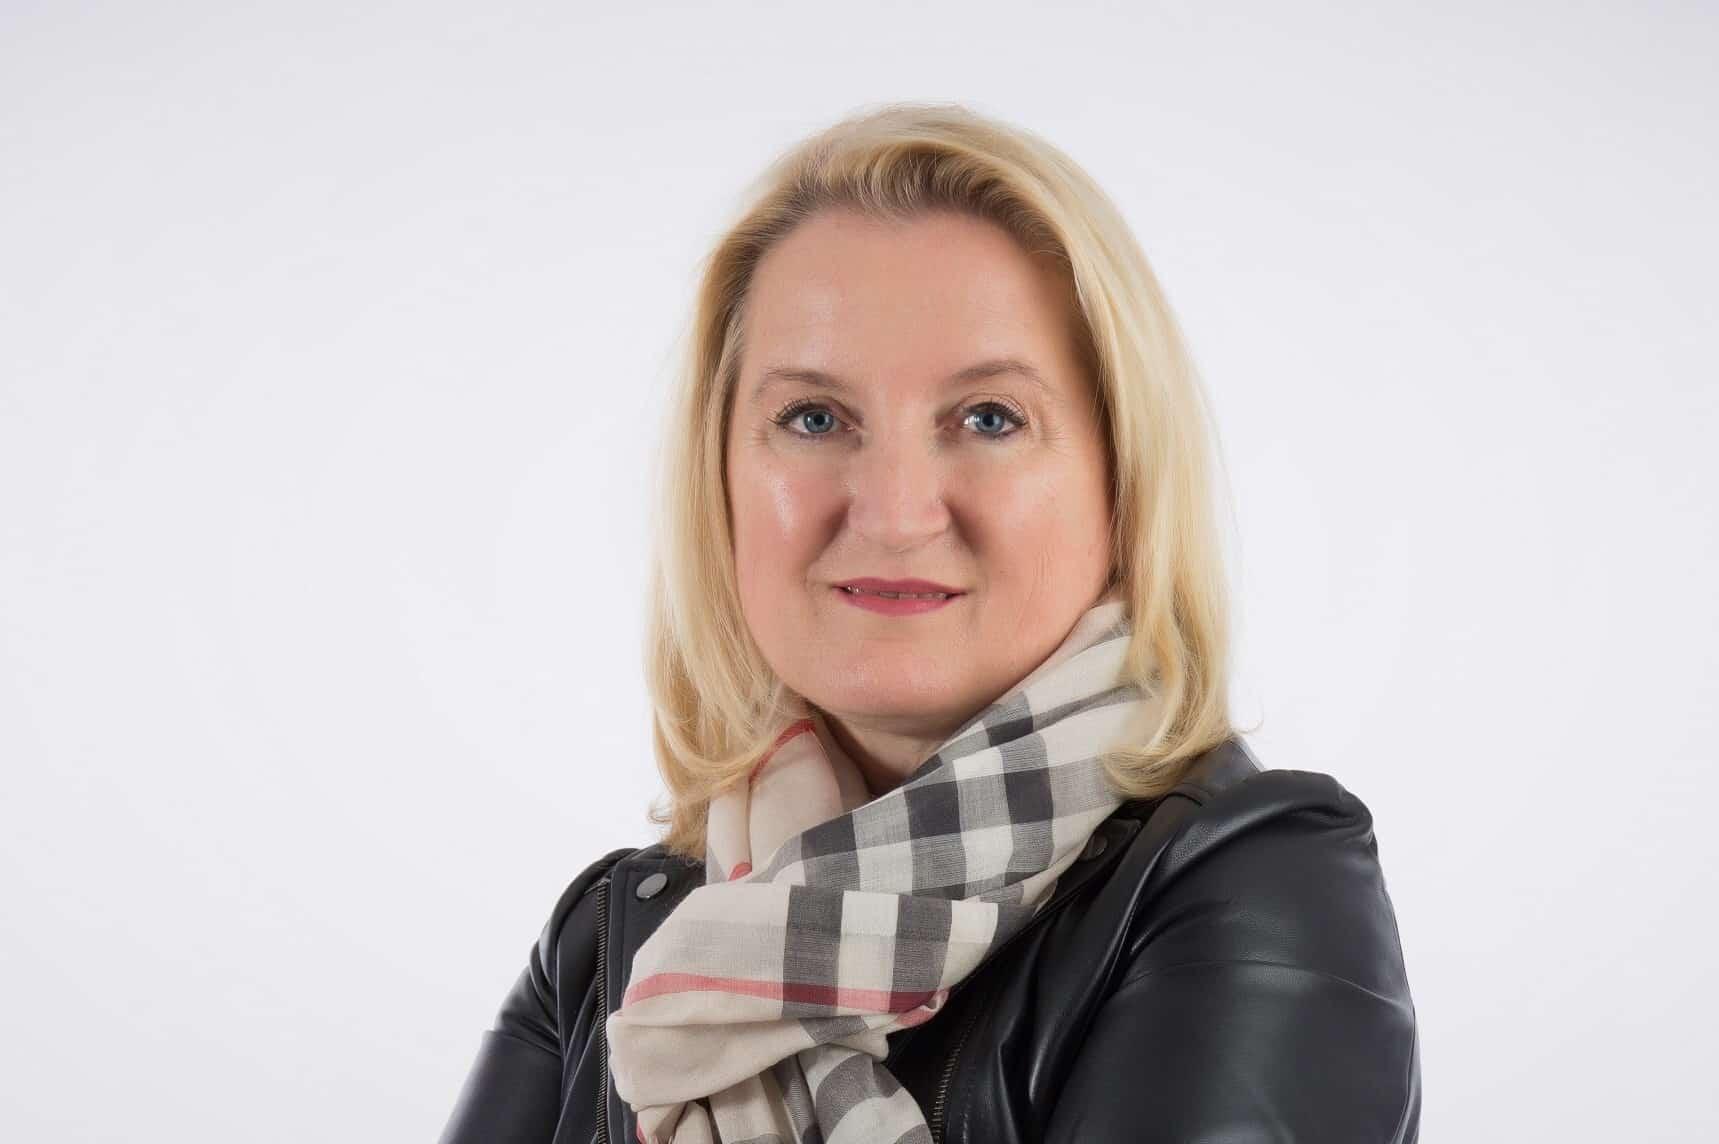 Verena Hahn-Oberthaler